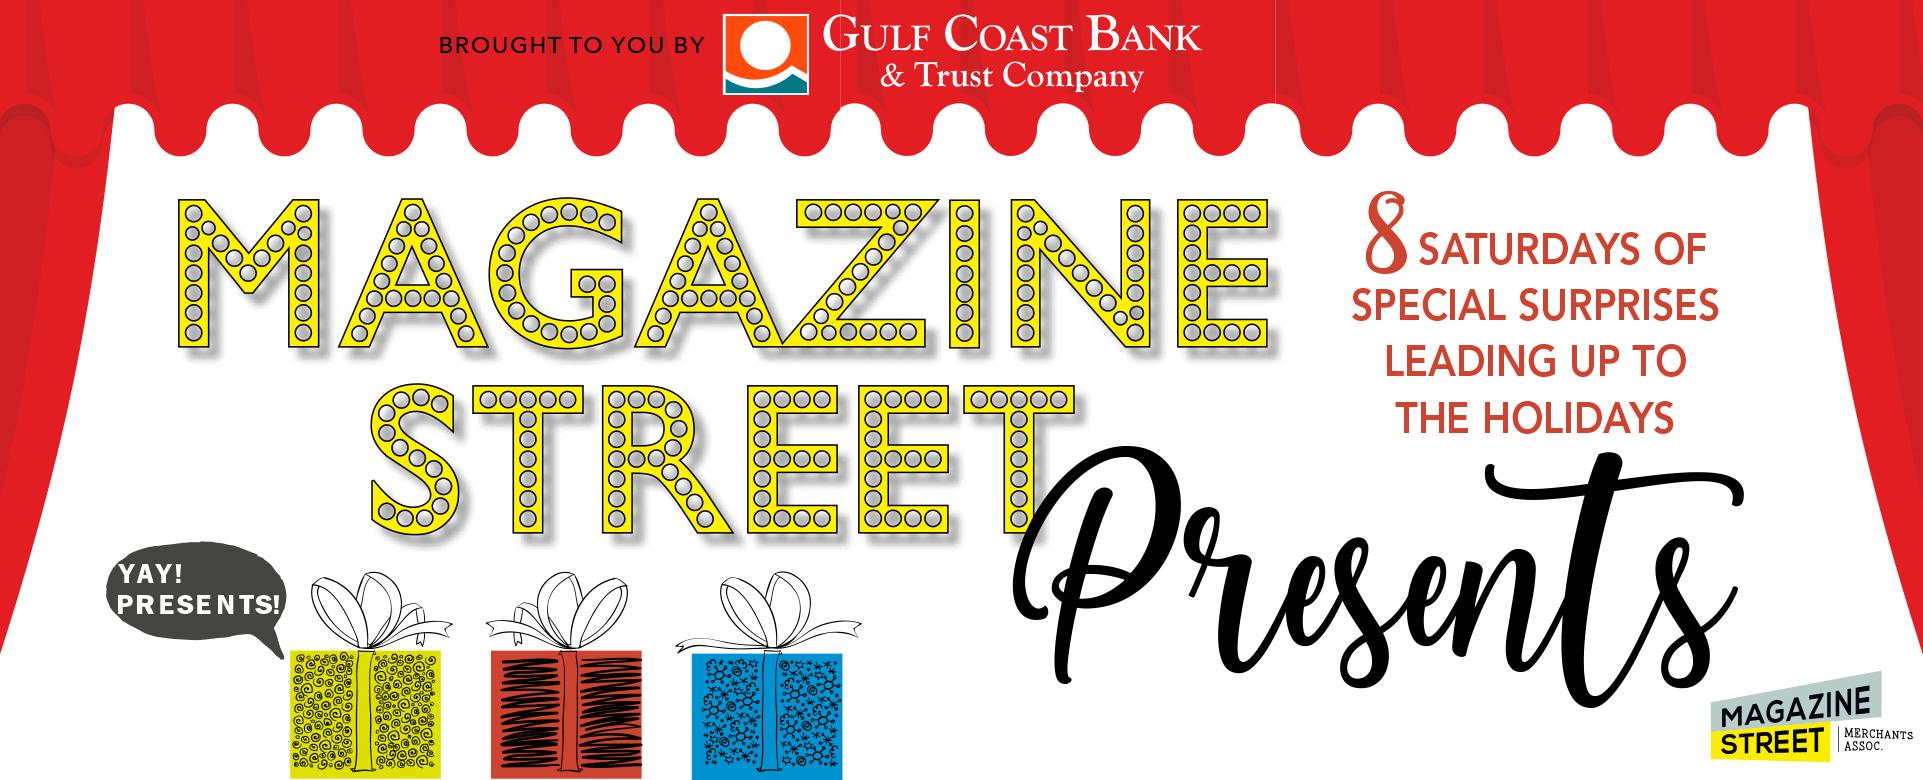 Magazine Street Presents... The Treat Factory